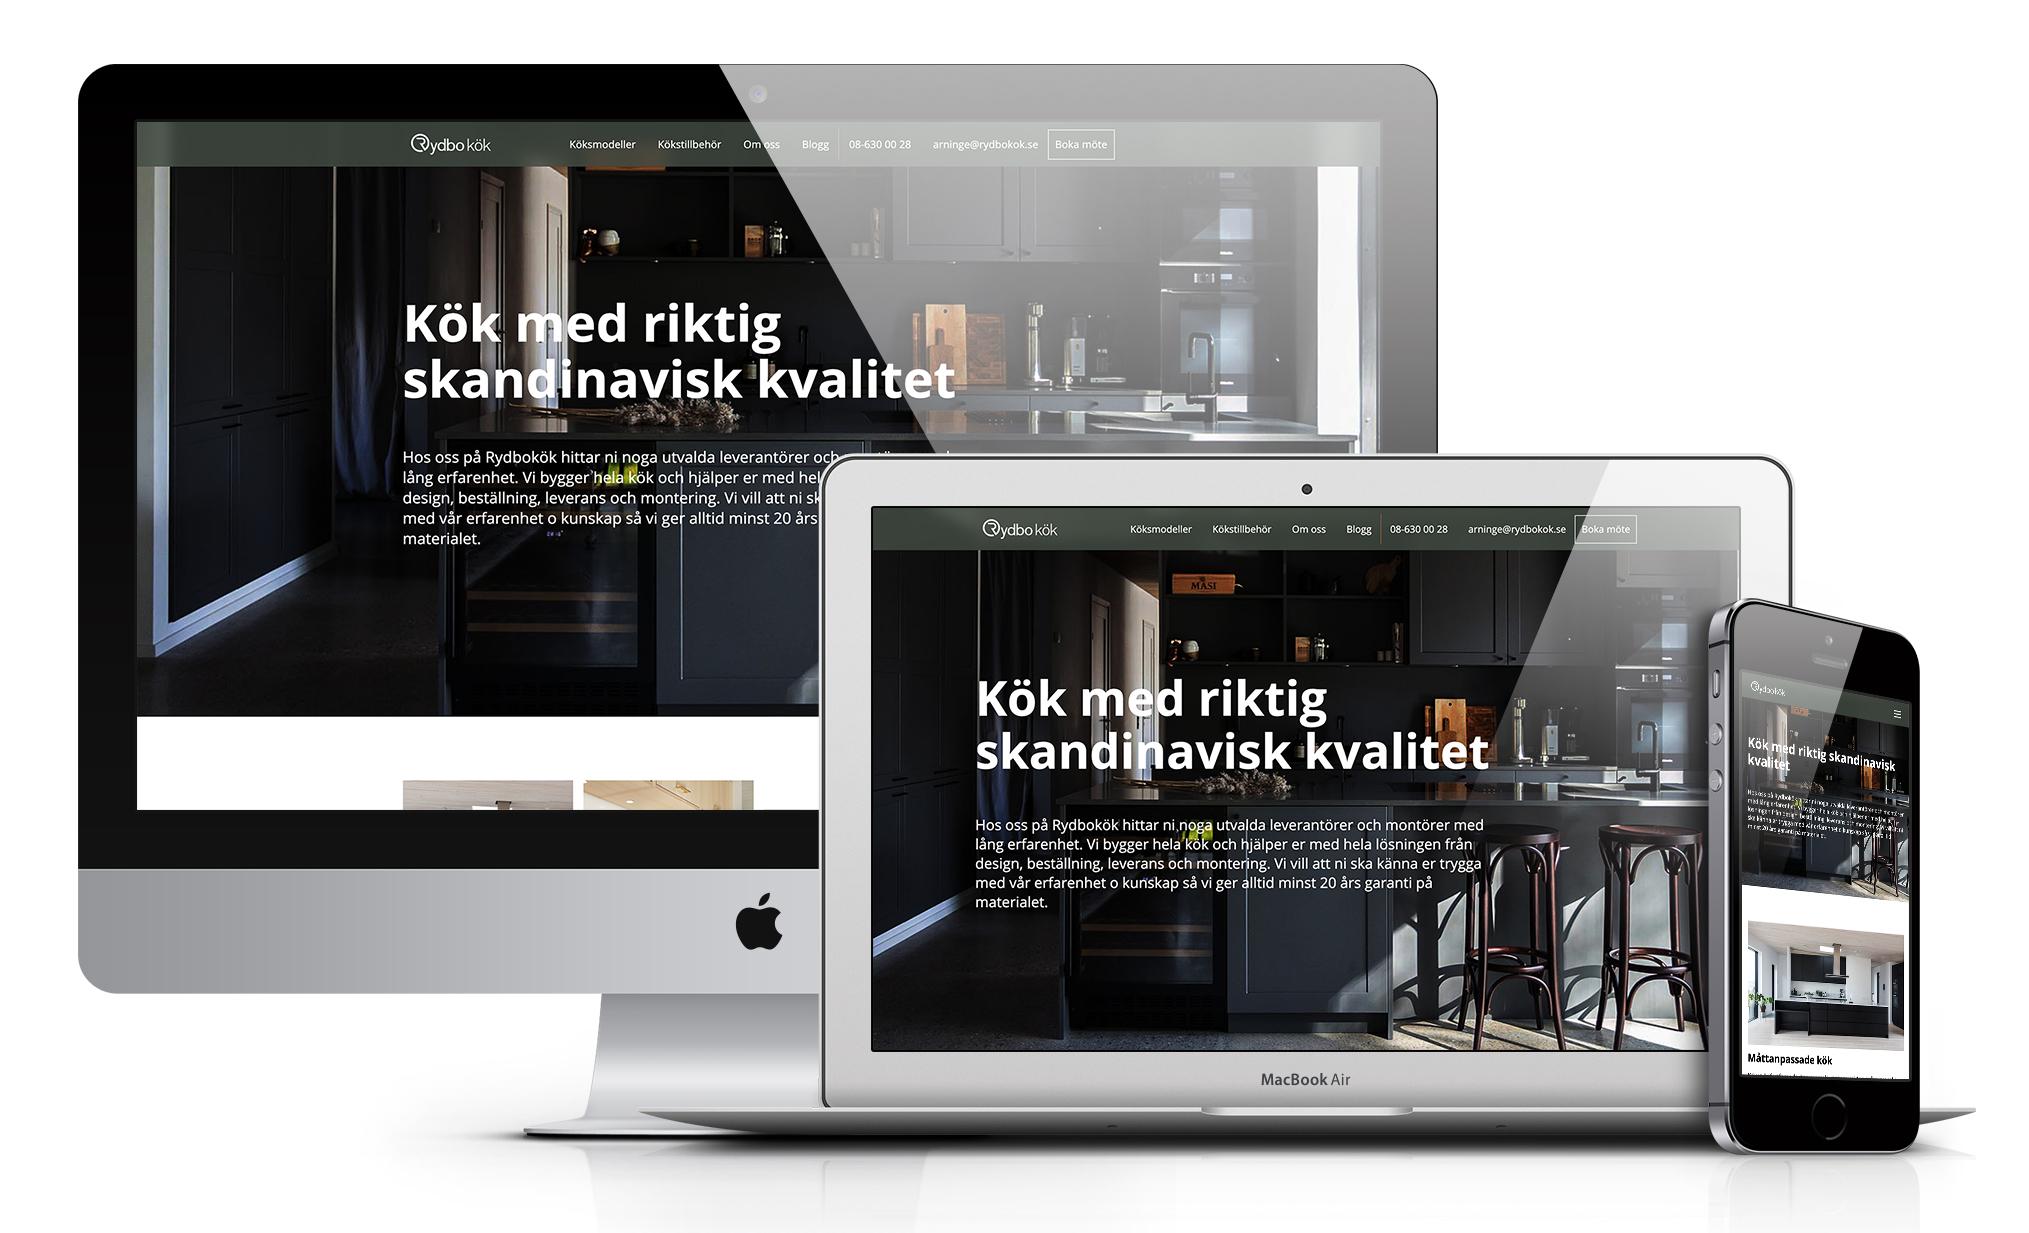 Rydbokök.se säljer måttanpassade kök title=